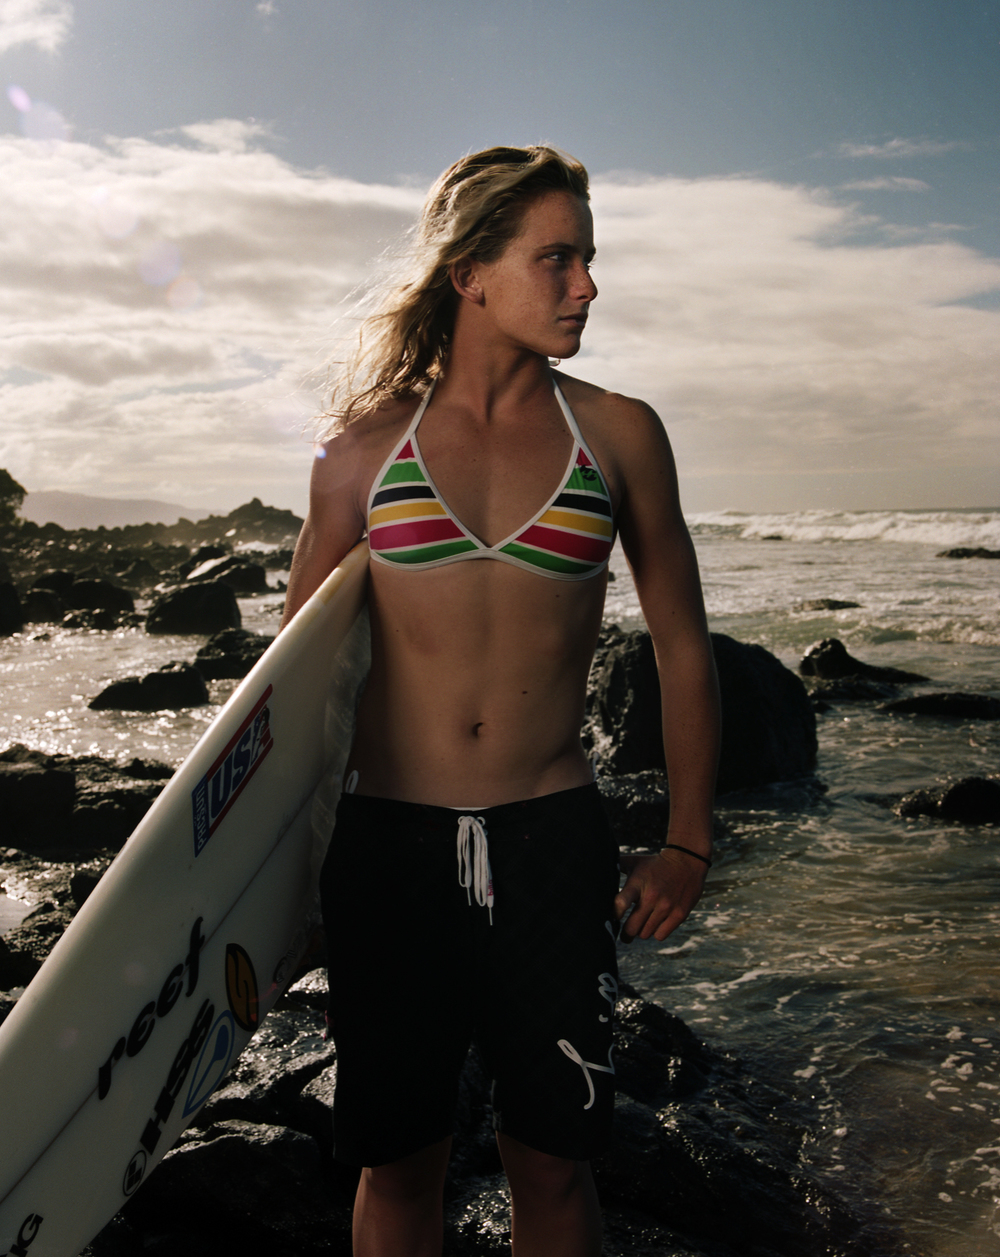 Courtney Conlogue - North Shore Oahu, HI